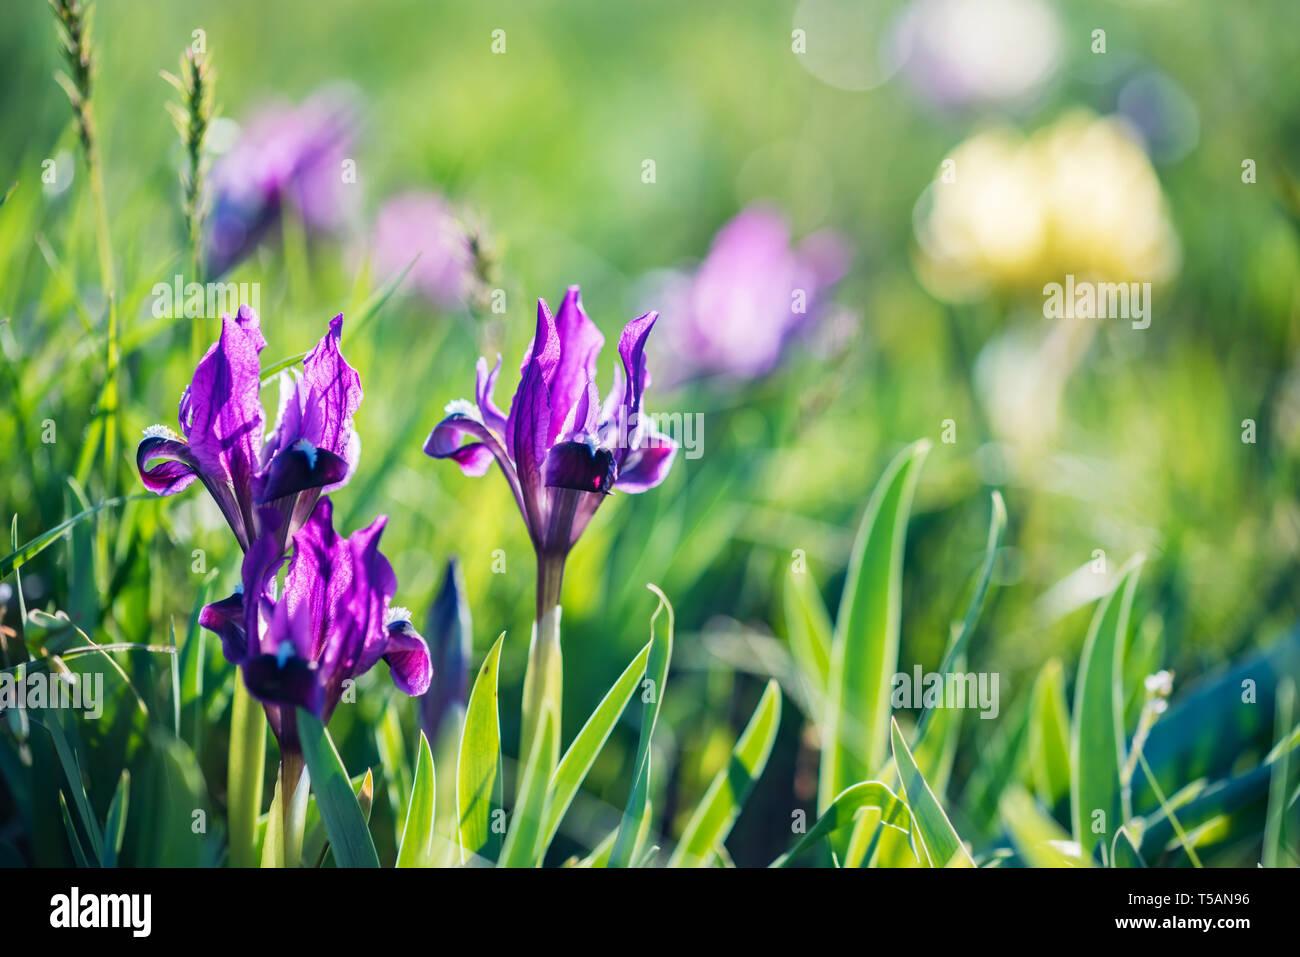 Steppe Flower Stockfotos & Steppe Flower Bilder